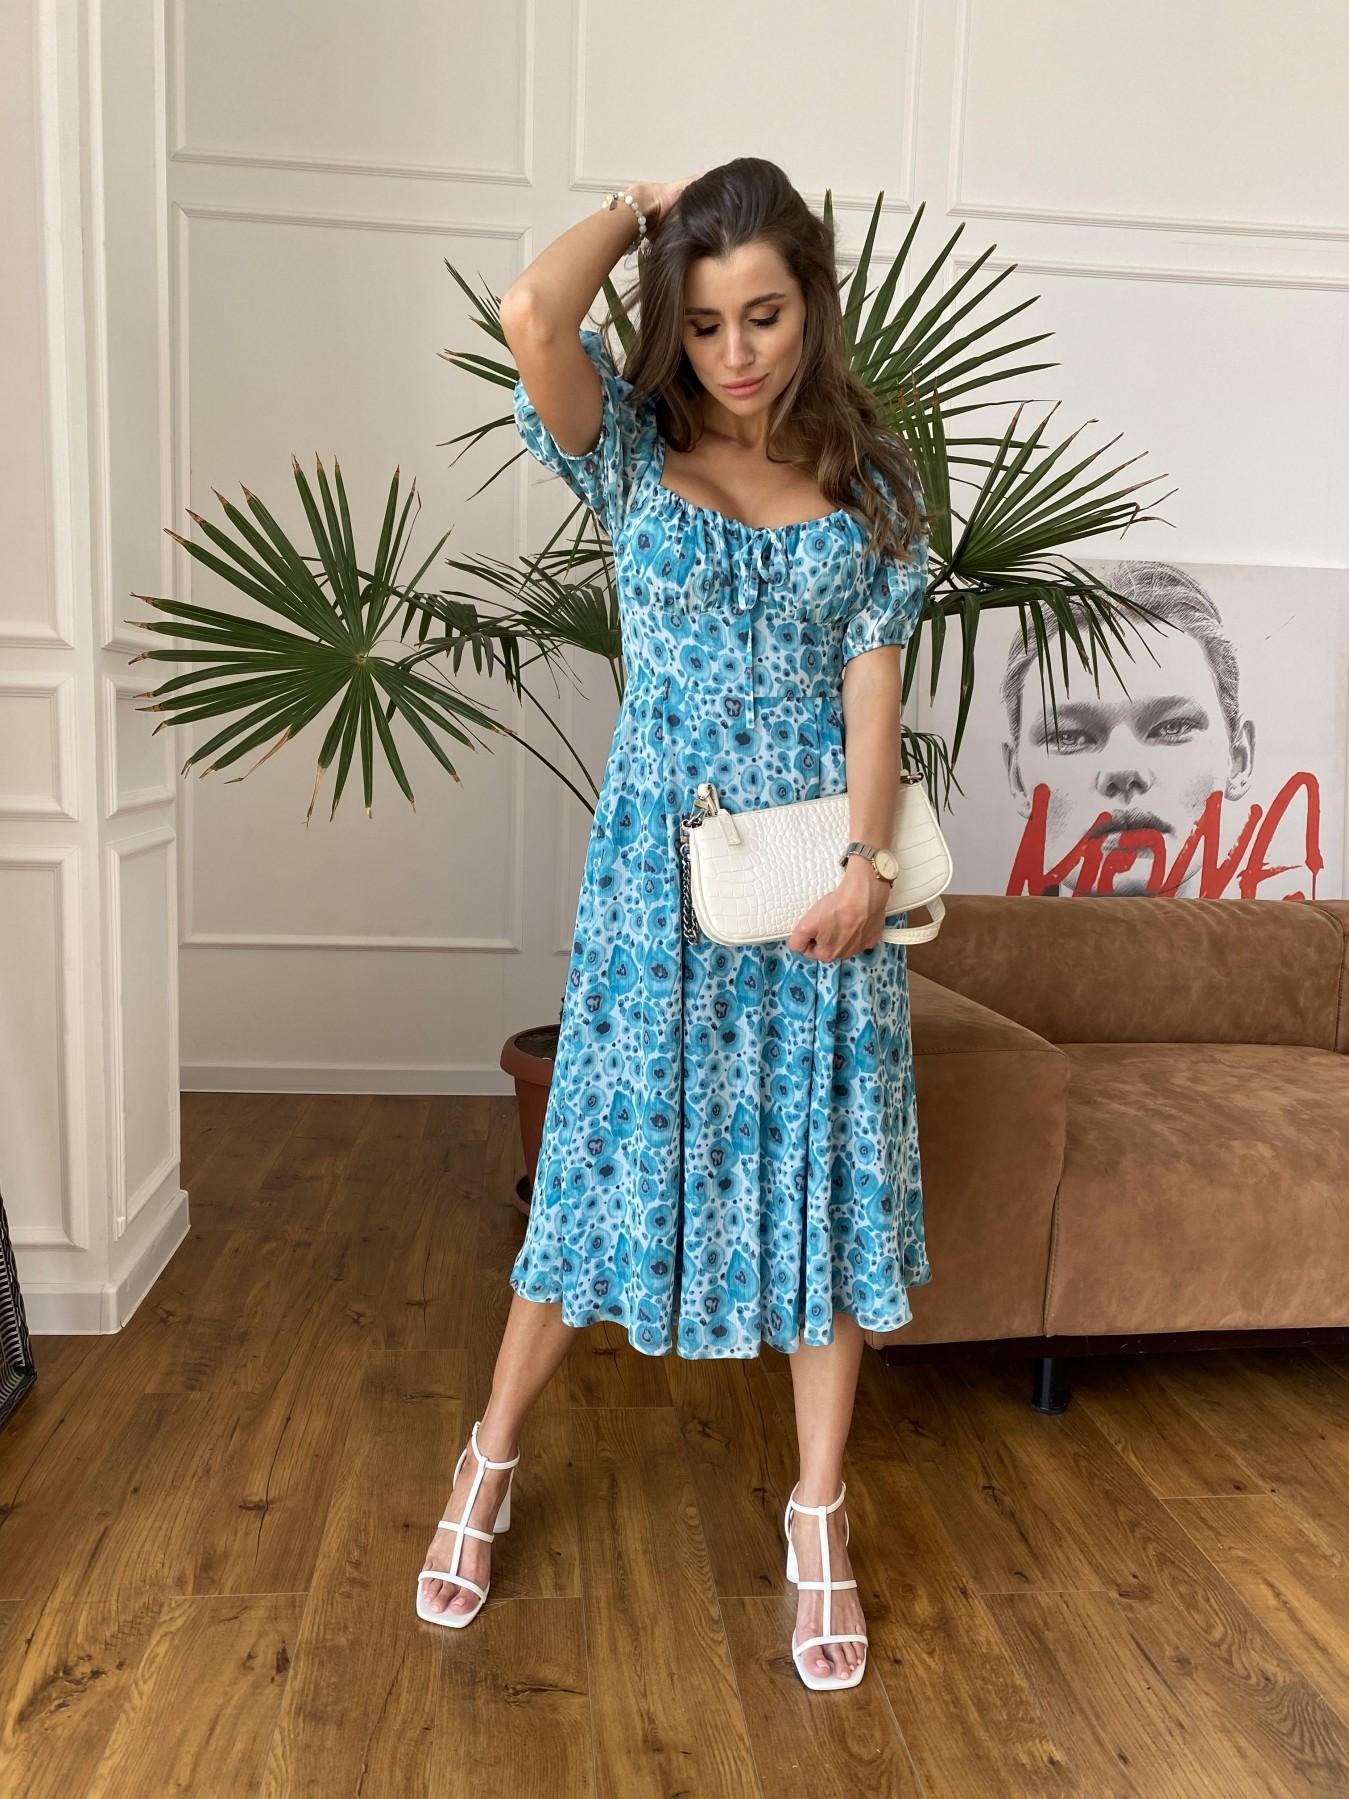 Кисес Миди платье из креп шифона в принт 11575 АРТ. 48269 Цвет: Маки/ Бирюза - фото 5, интернет магазин tm-modus.ru